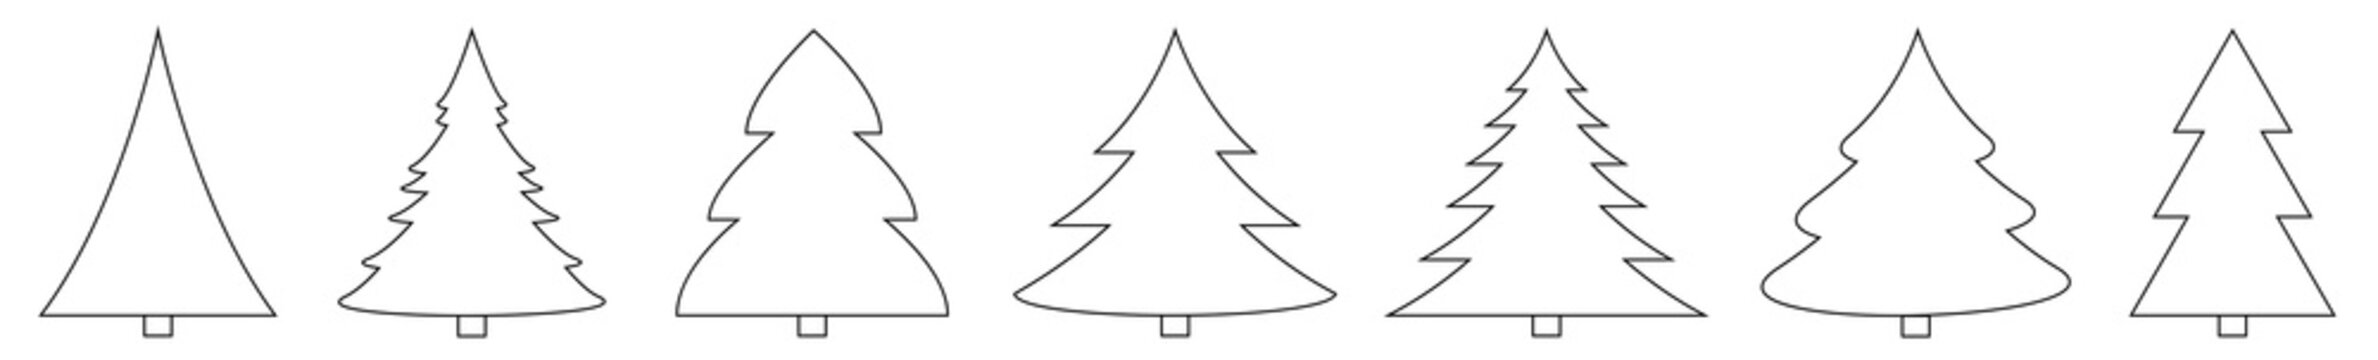 Christmas Tree Black Shape Icon | Fir Tree Illustration | x-mas Symbol | Logo | Isolated Variations